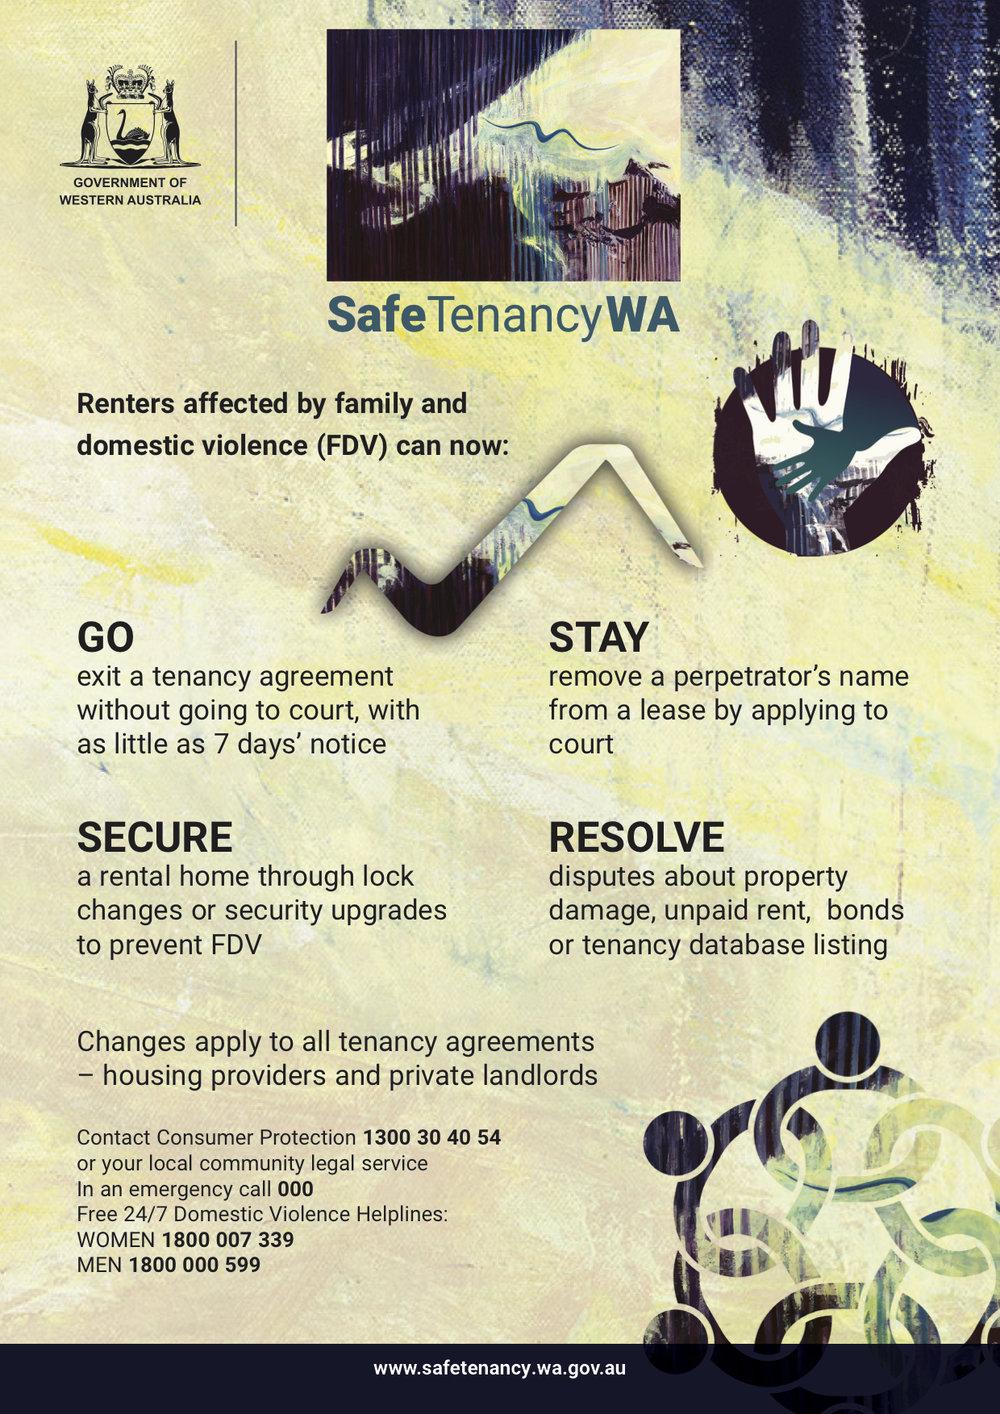 safe-tenancy-wa-poster+page+1.jpg